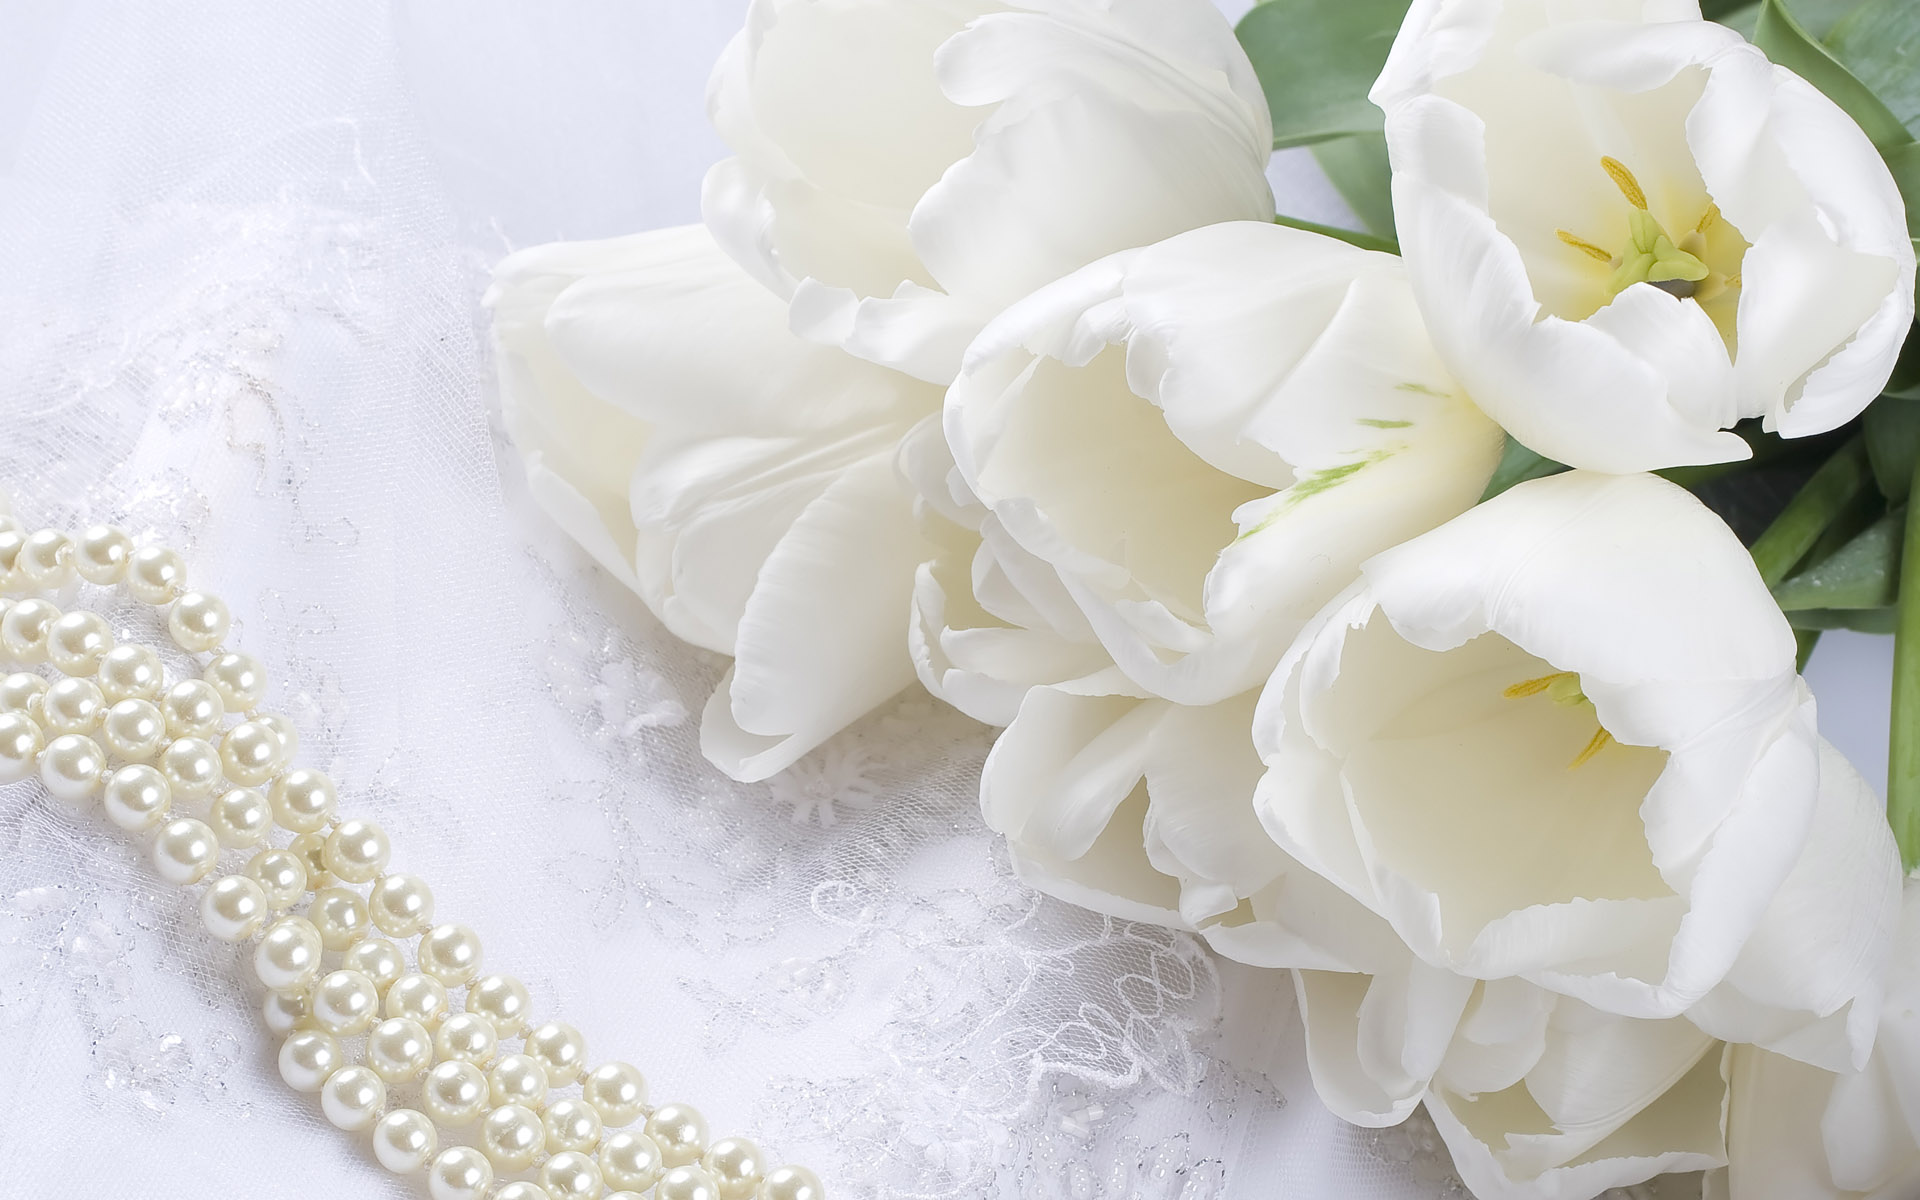 YouWall White Flowers Wallpaper wallpaperwallpapersfree